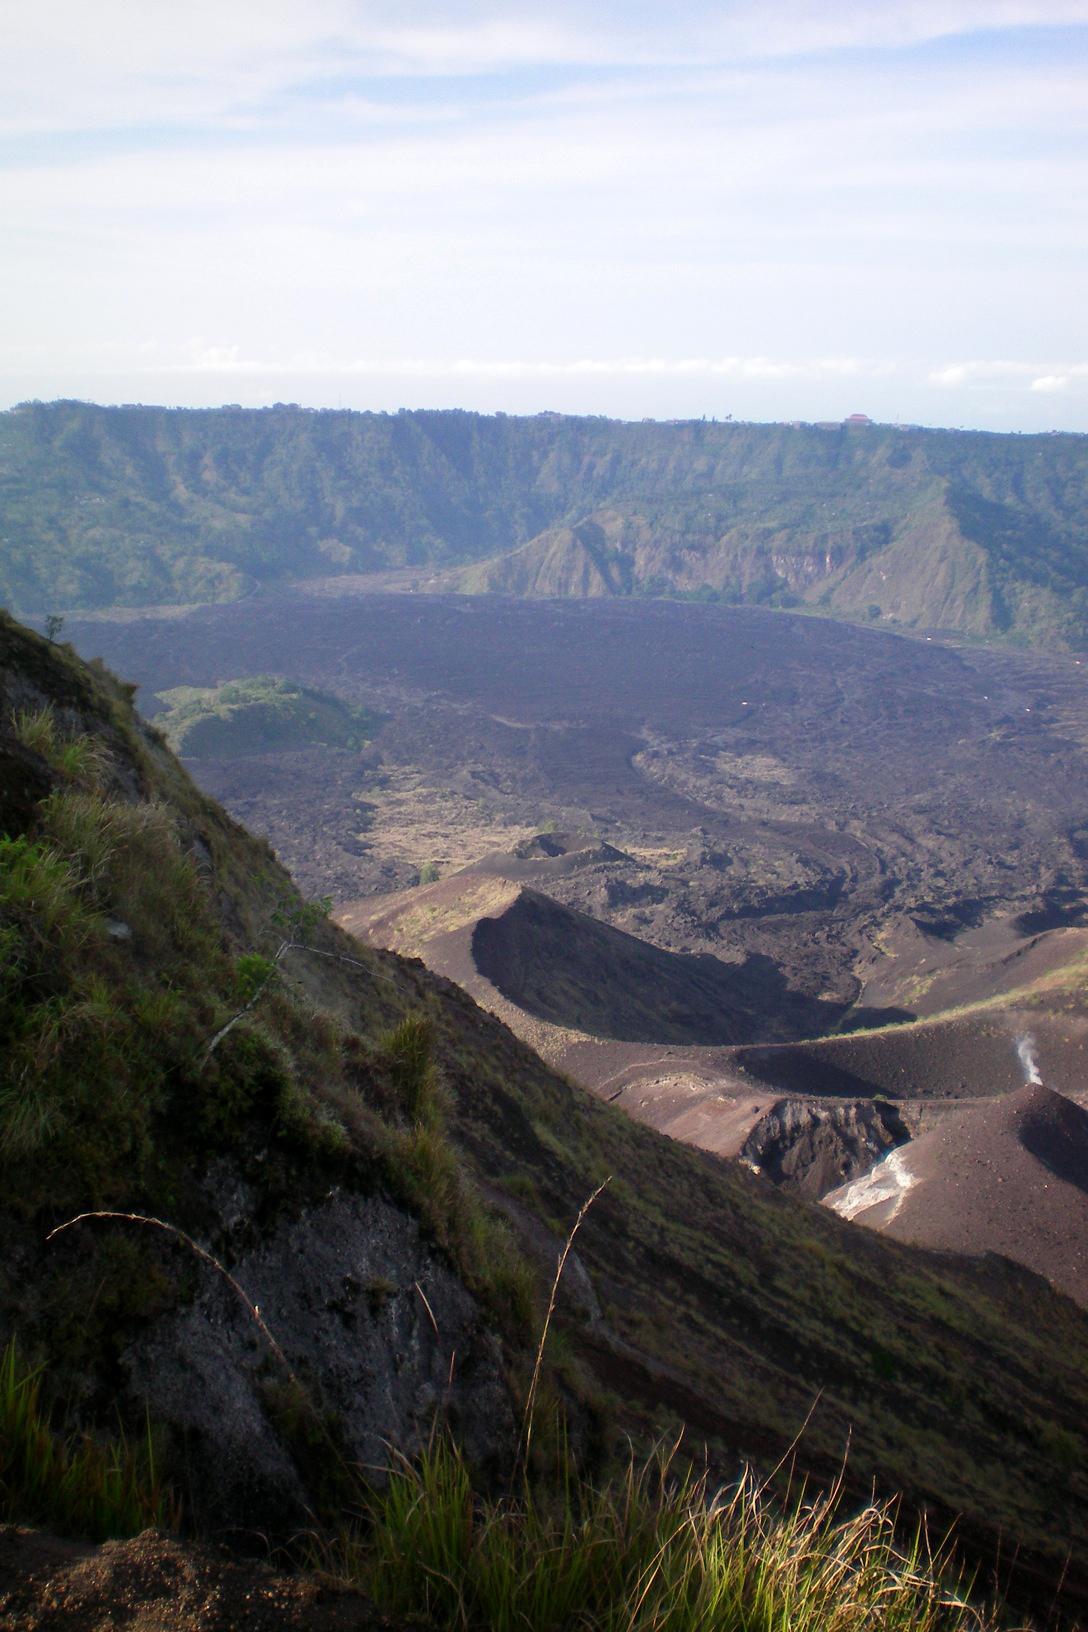 Vulkan Bali